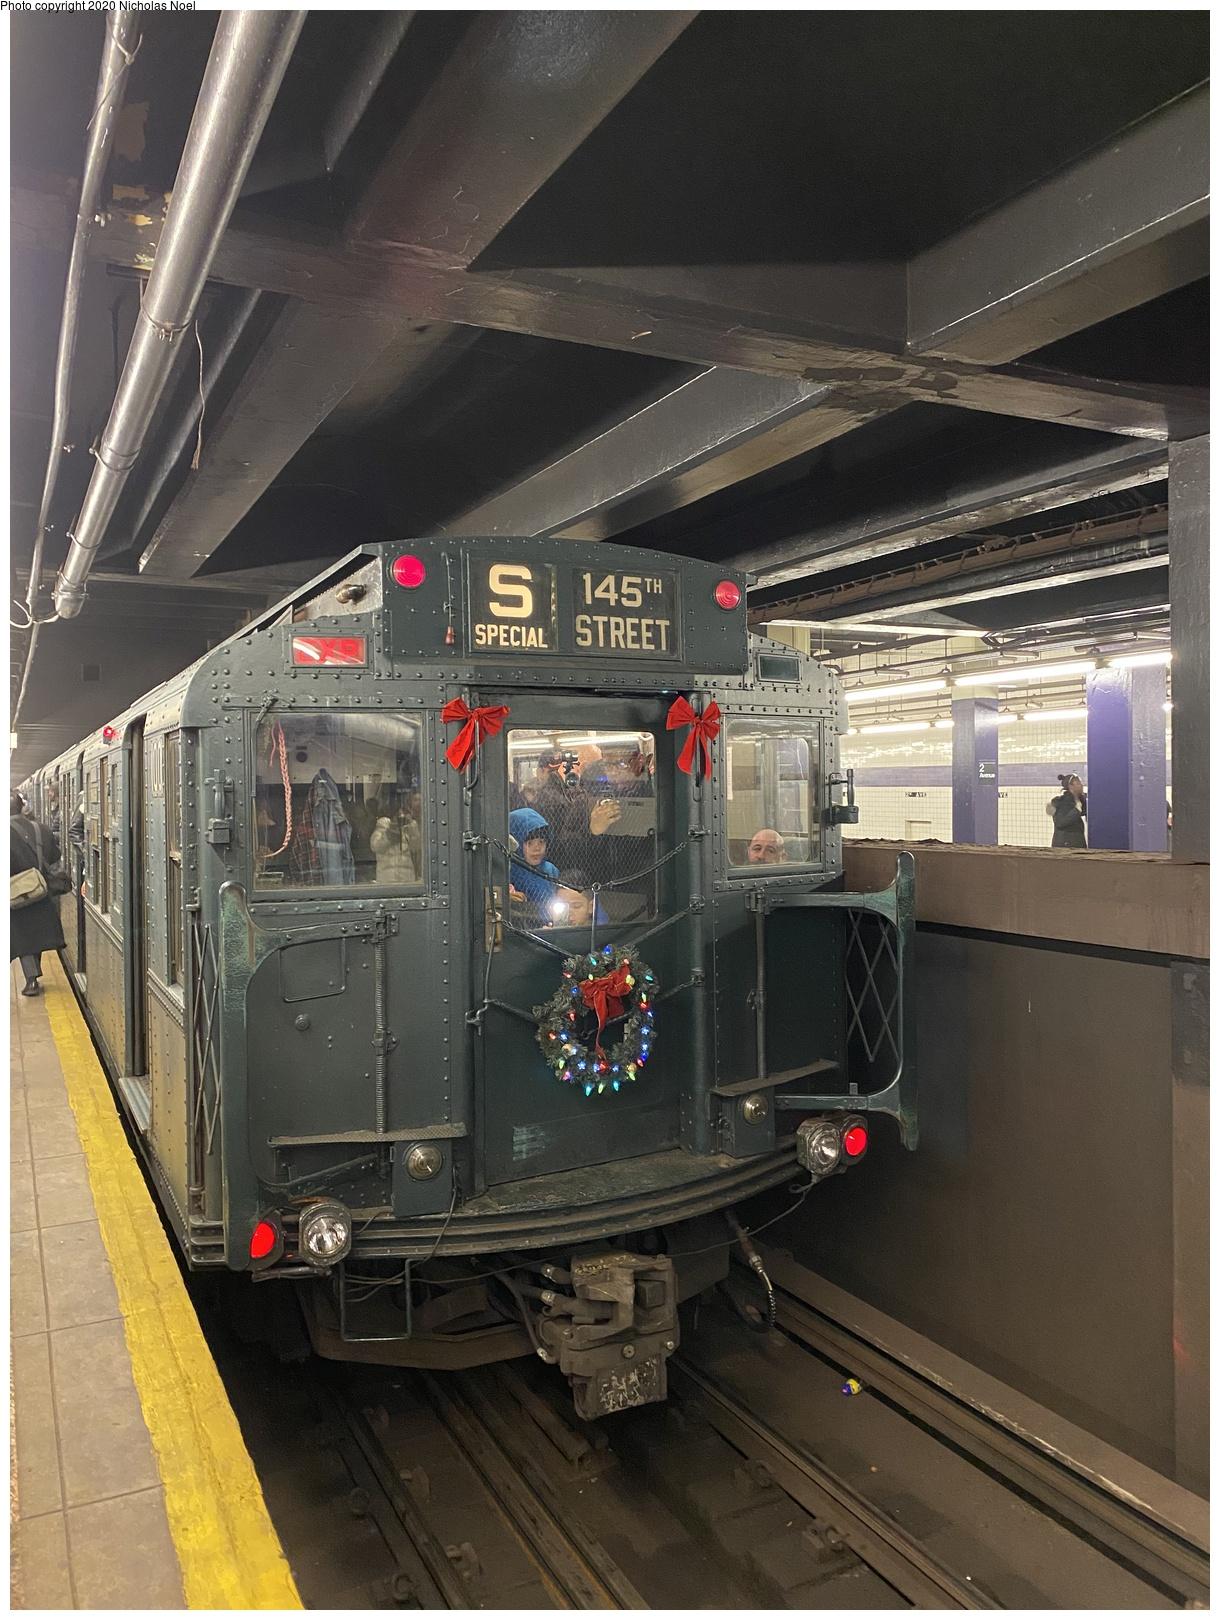 (724k, 1220x1620)<br><b>Country:</b> United States<br><b>City:</b> New York<br><b>System:</b> New York City Transit<br><b>Line:</b> IND 6th Avenue Line<br><b>Location:</b> 2nd Avenue<br><b>Route:</b> Museum Train Service<br><b>Car:</b> R-1 (American Car & Foundry, 1930-1931) 100 <br><b>Photo by:</b> Nicholas Noel<br><b>Date:</b> 12/22/2019<br><b>Viewed (this week/total):</b> 1 / 156